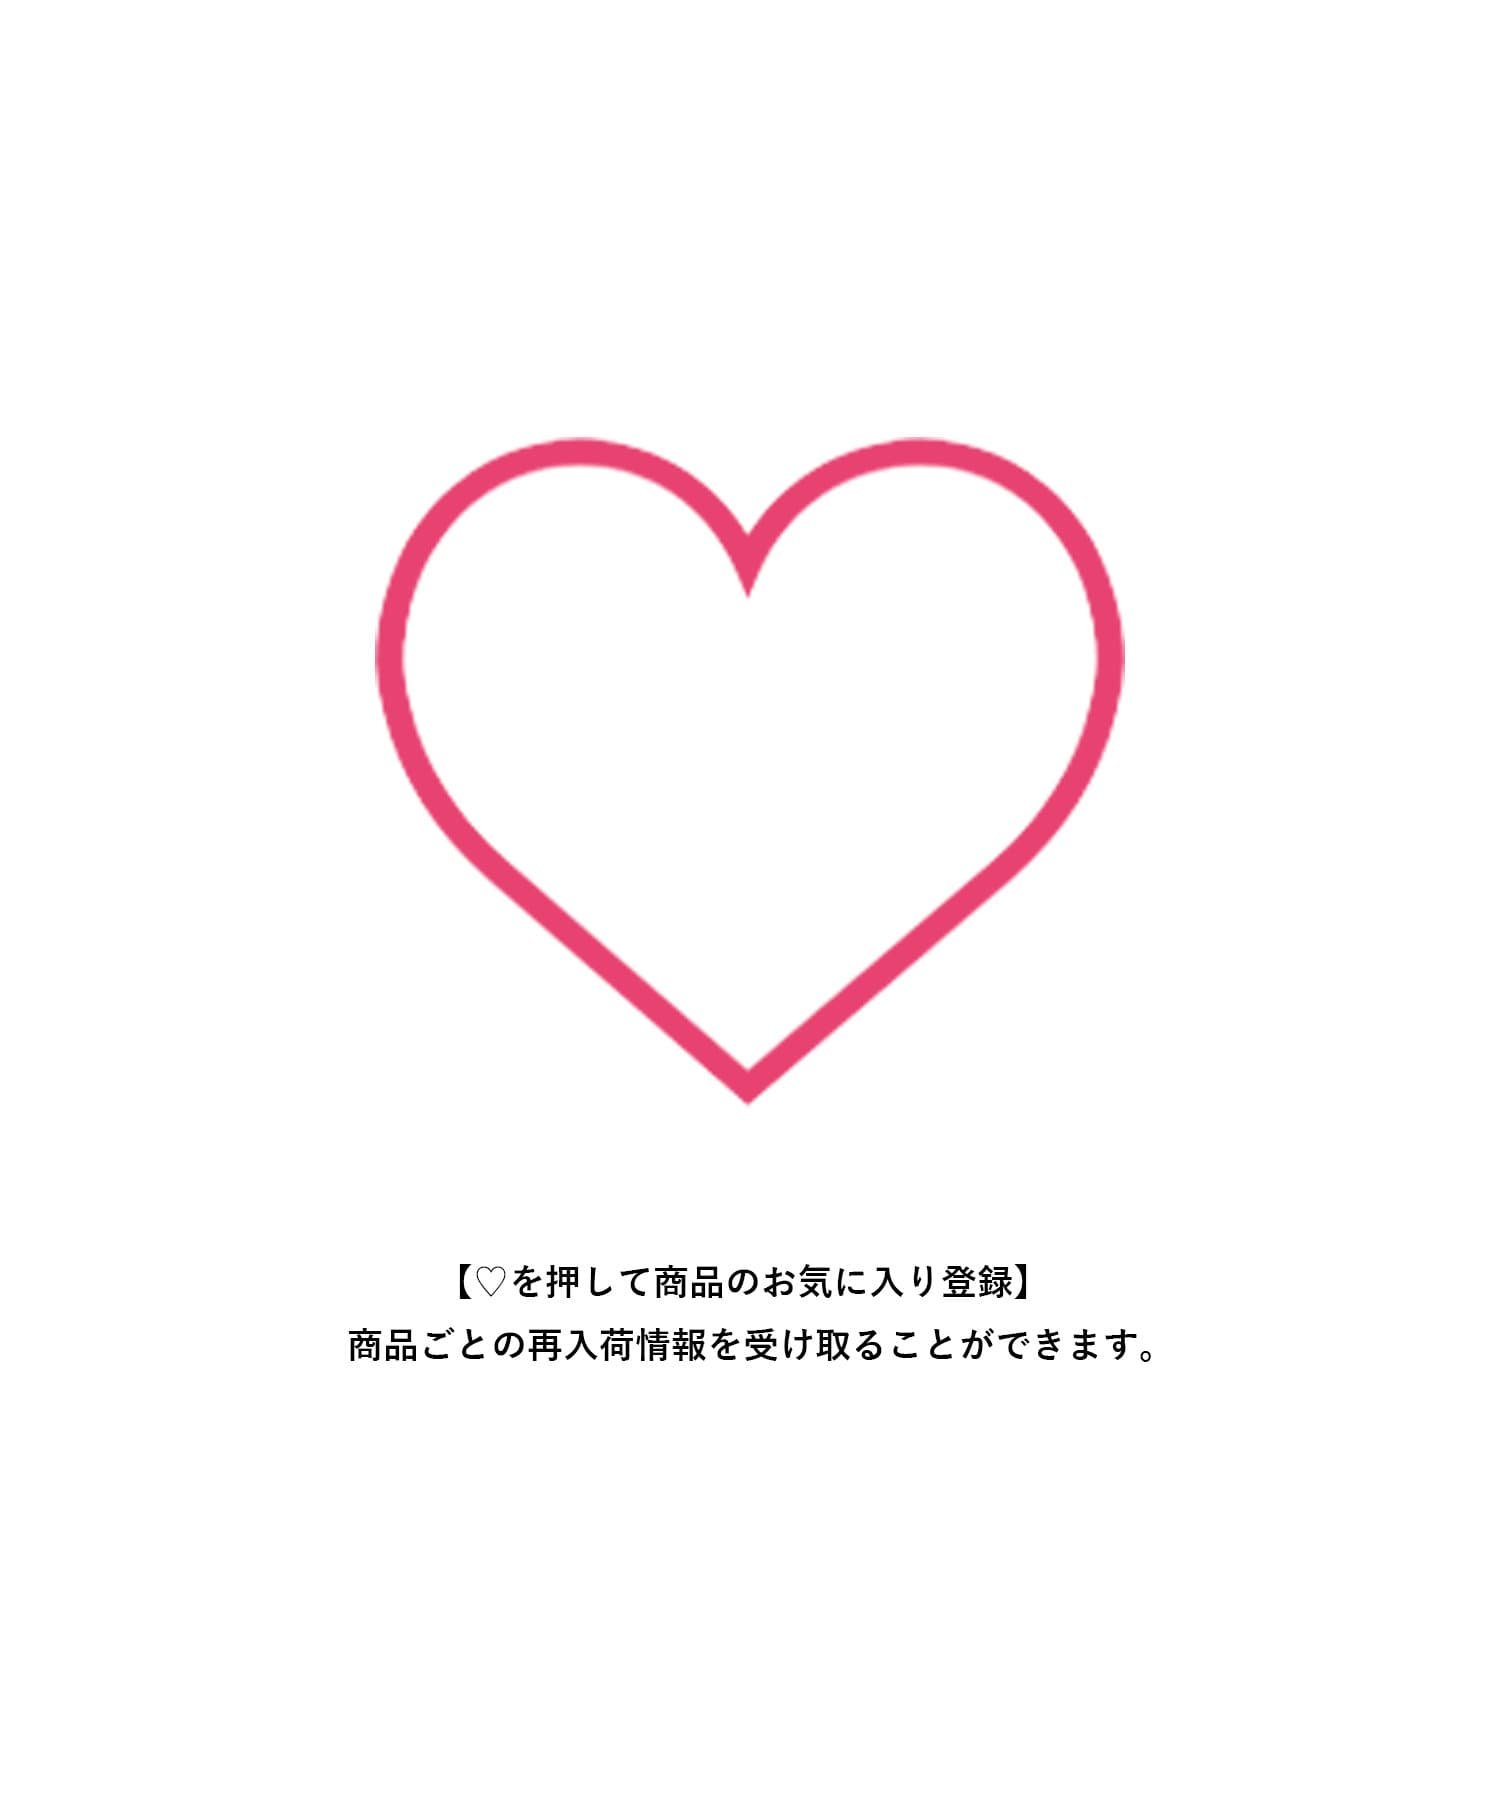 COLLAGE GALLARDAGALANTE(コラージュ ガリャルダガランテ) ☆大好評!再入荷☆Healthy DENIM別注 H.salt